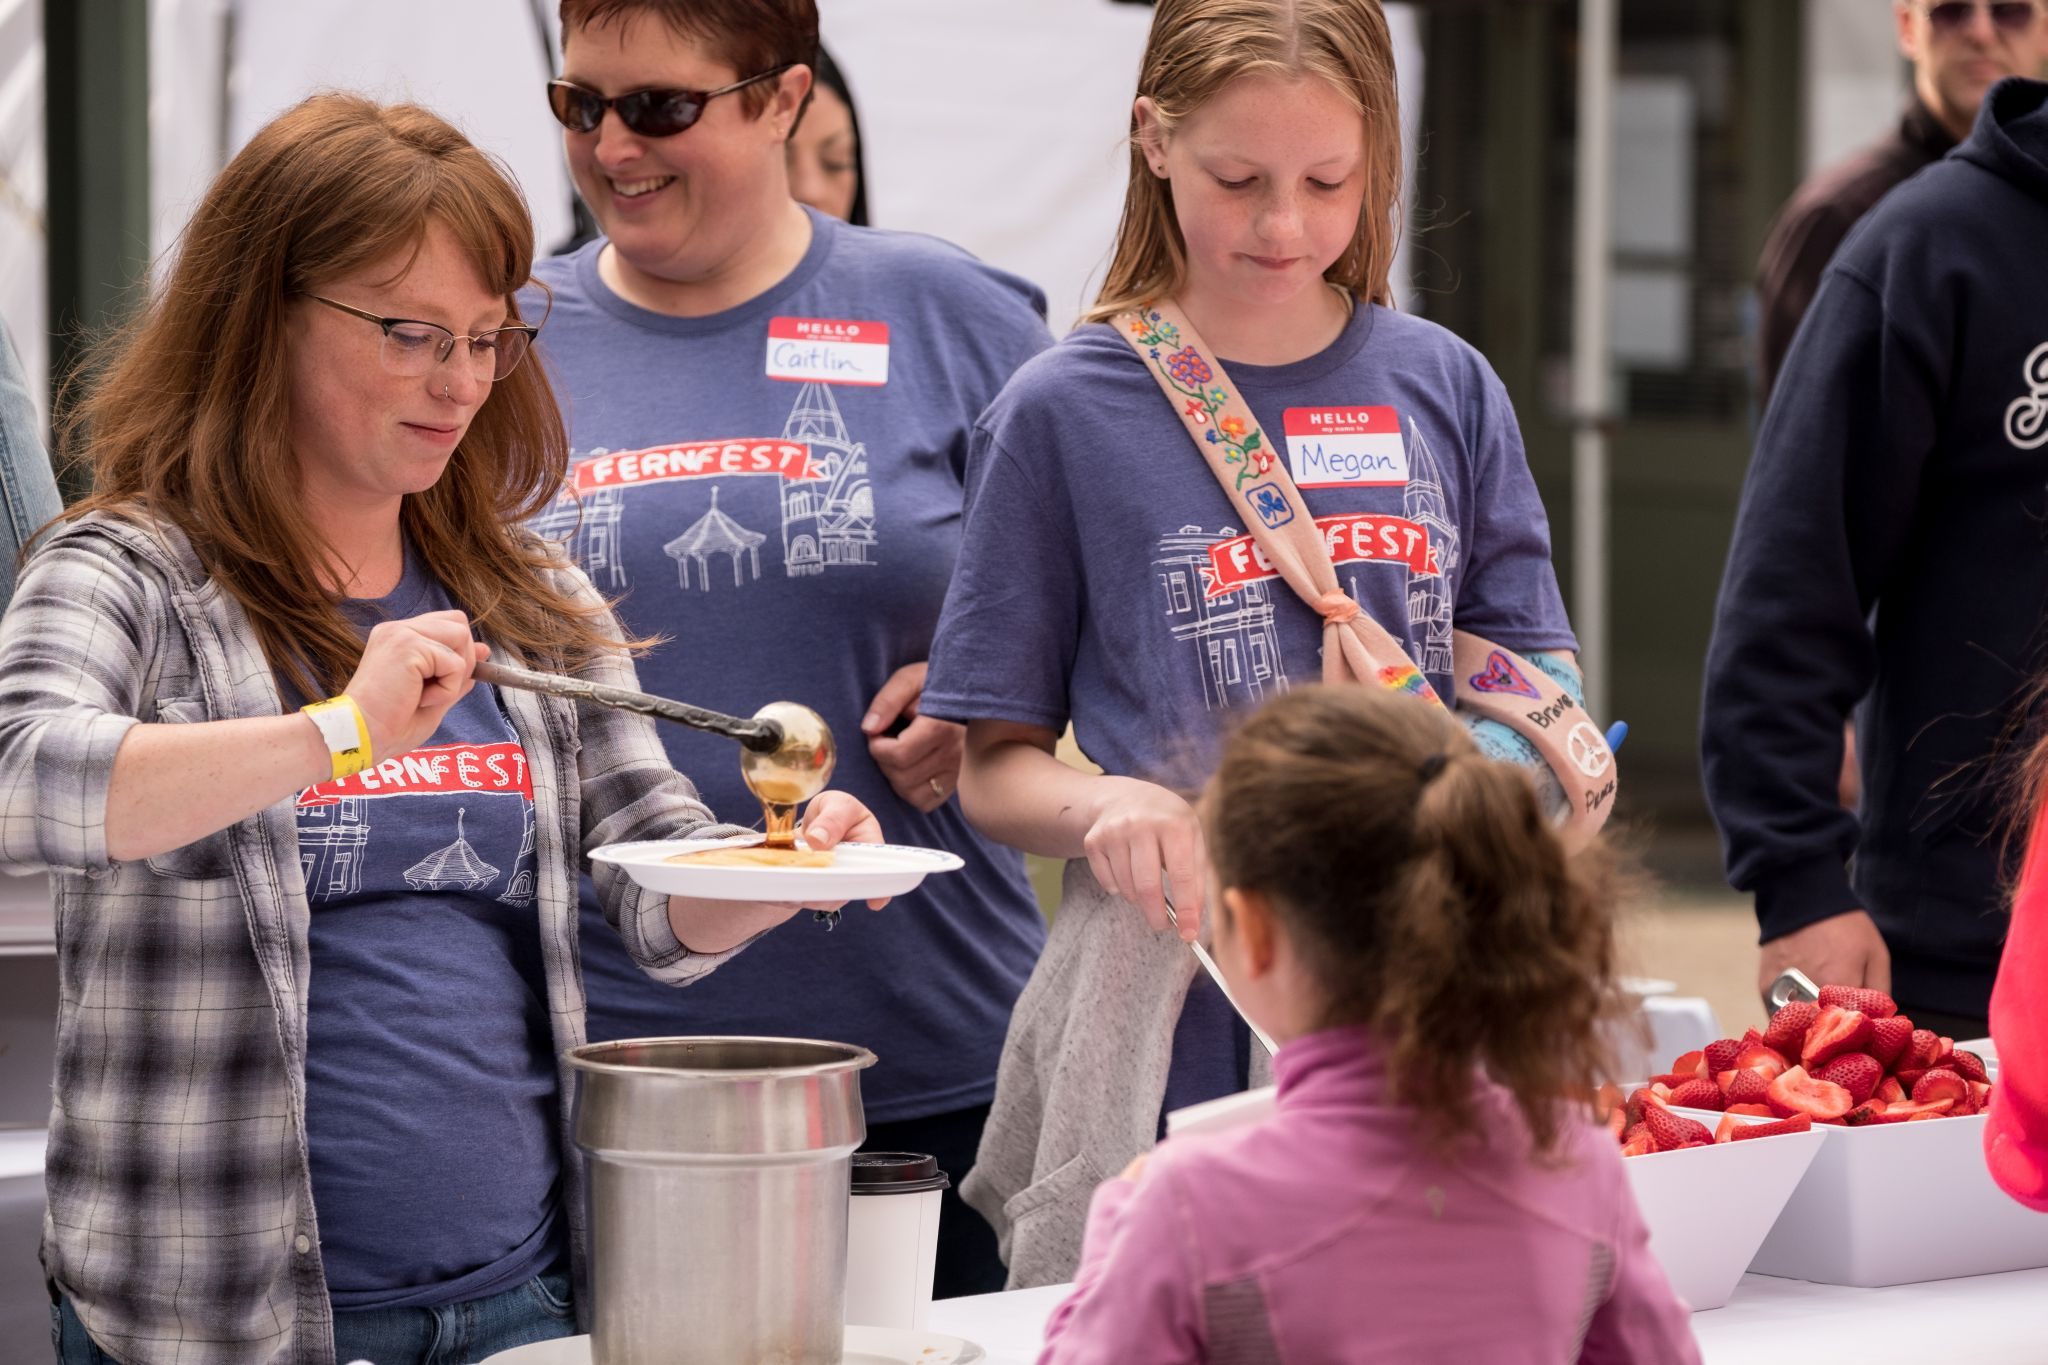 Volunteer at FernFest